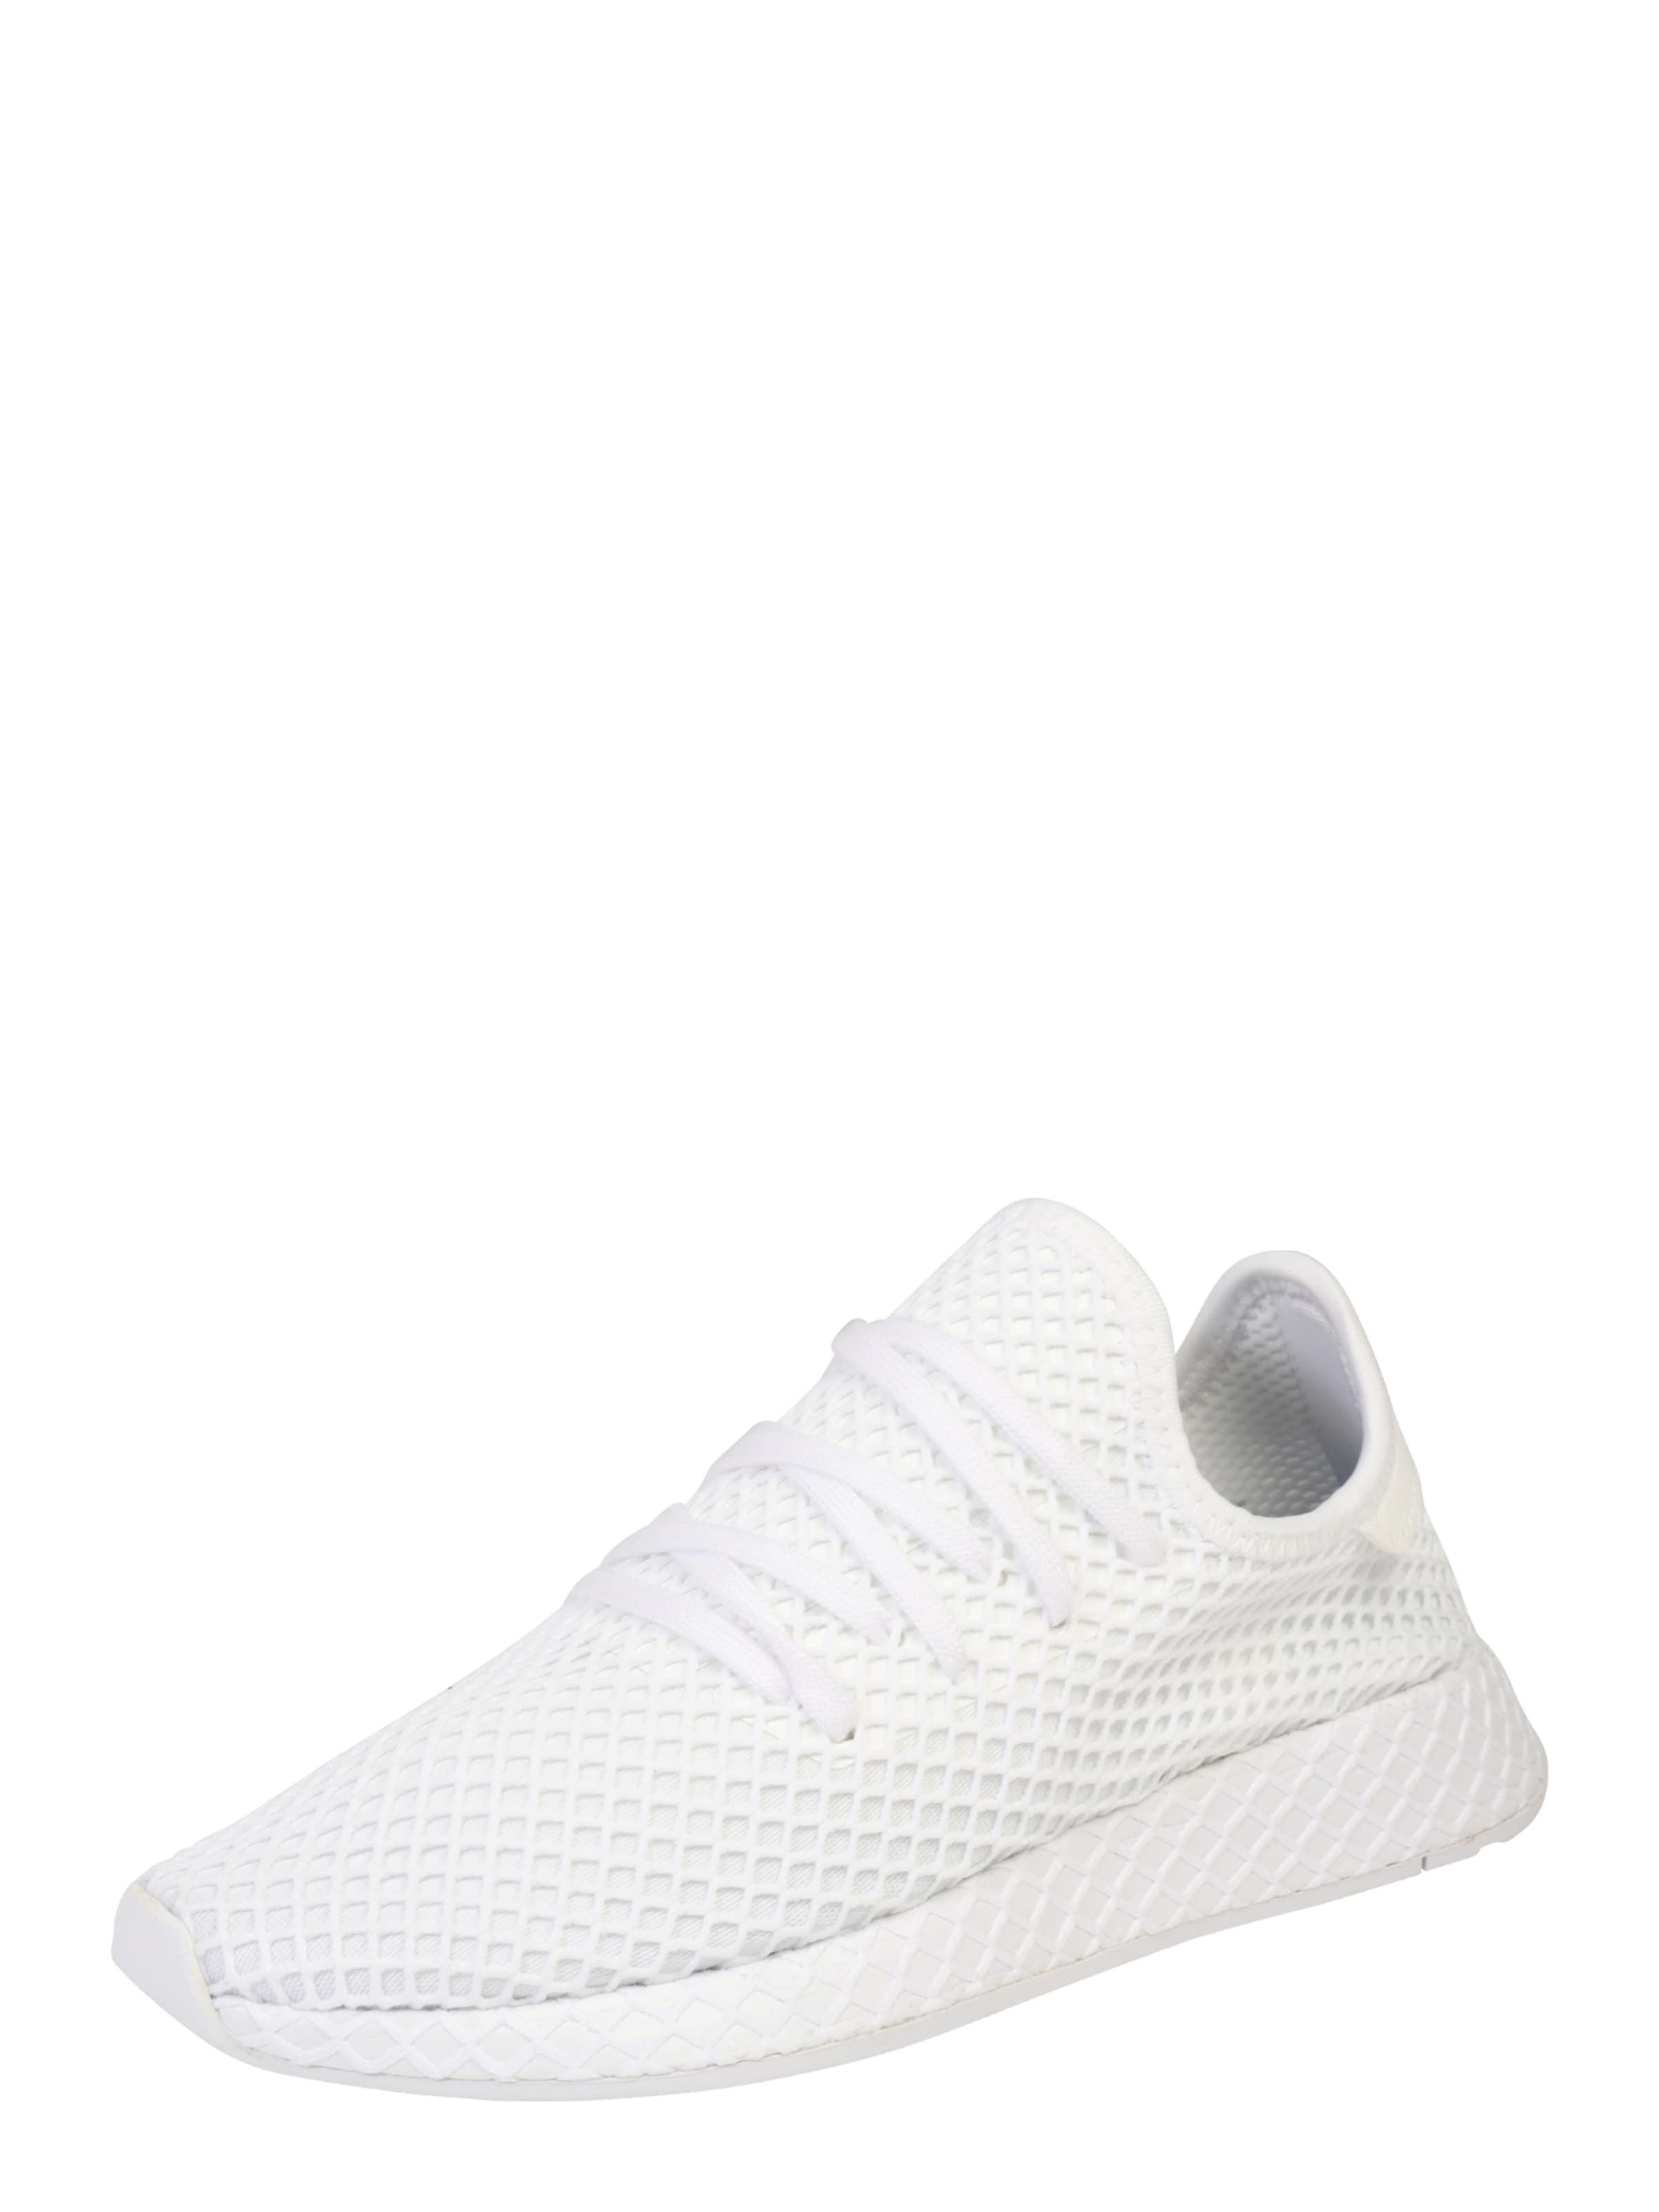 ADIDAS ORIGINALS Sneaker DEERUPT RUNNER Hohe Qualität